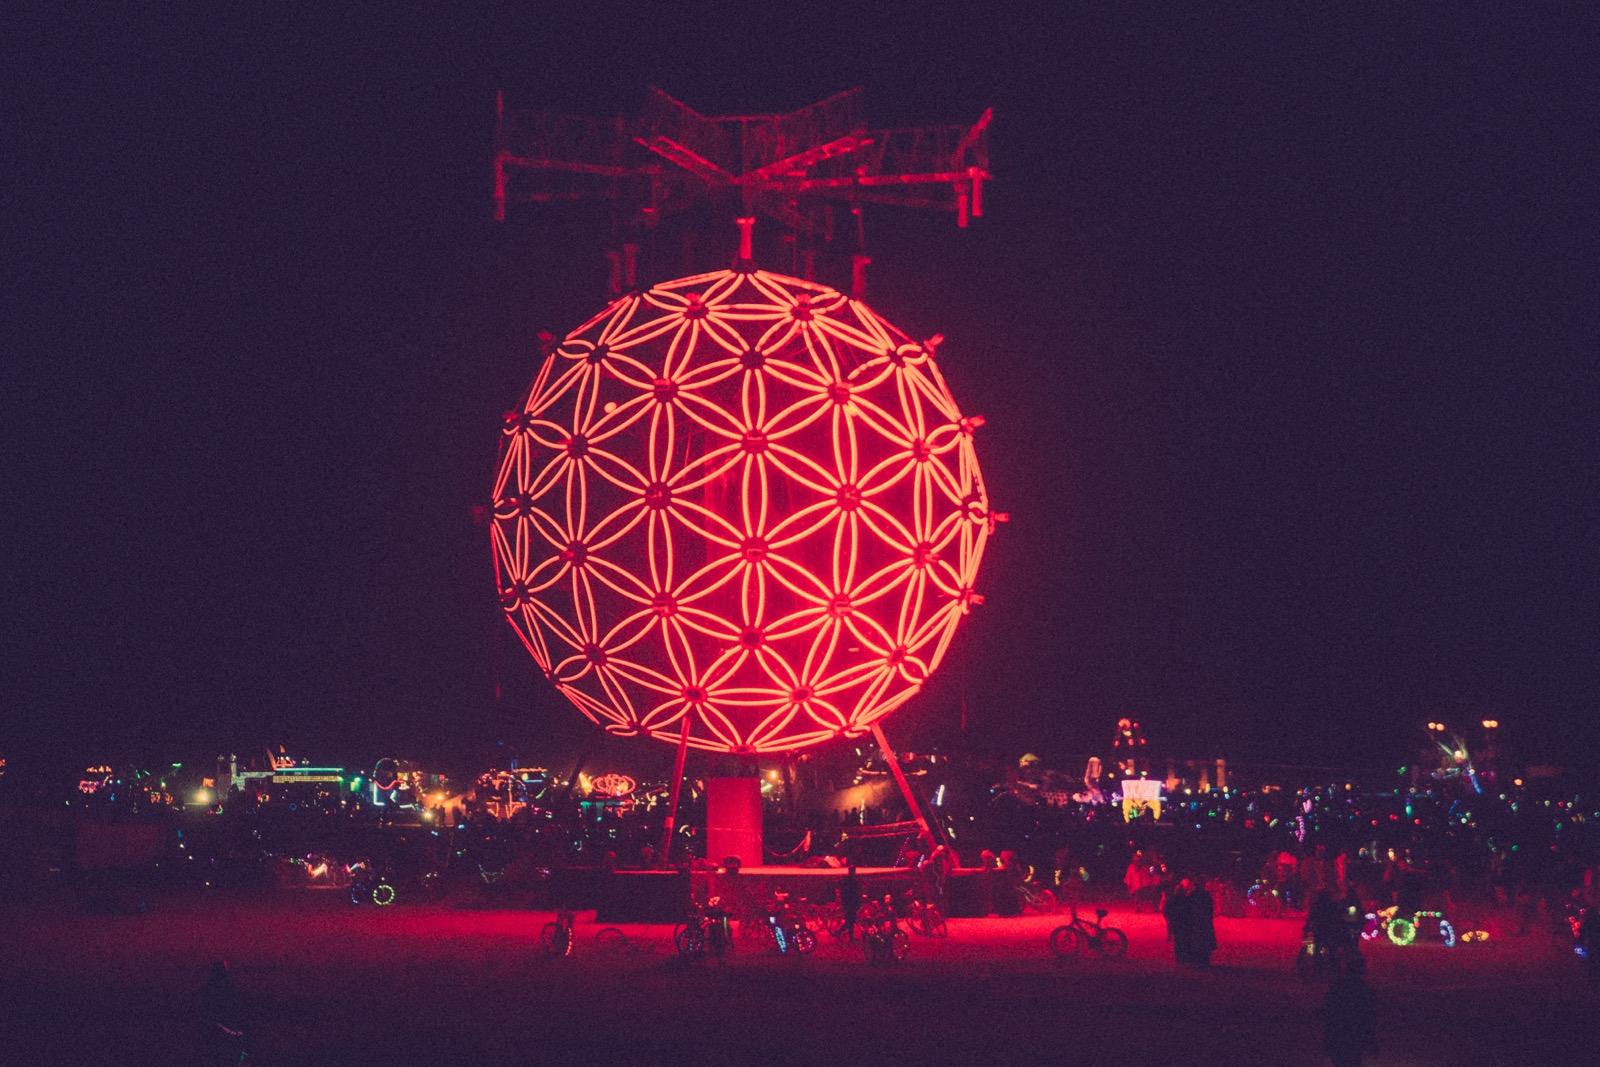 Lucent Dossier Crowd Burning_Man_2015_Galen_Oakes_Art - 6 of 20-1.jpg